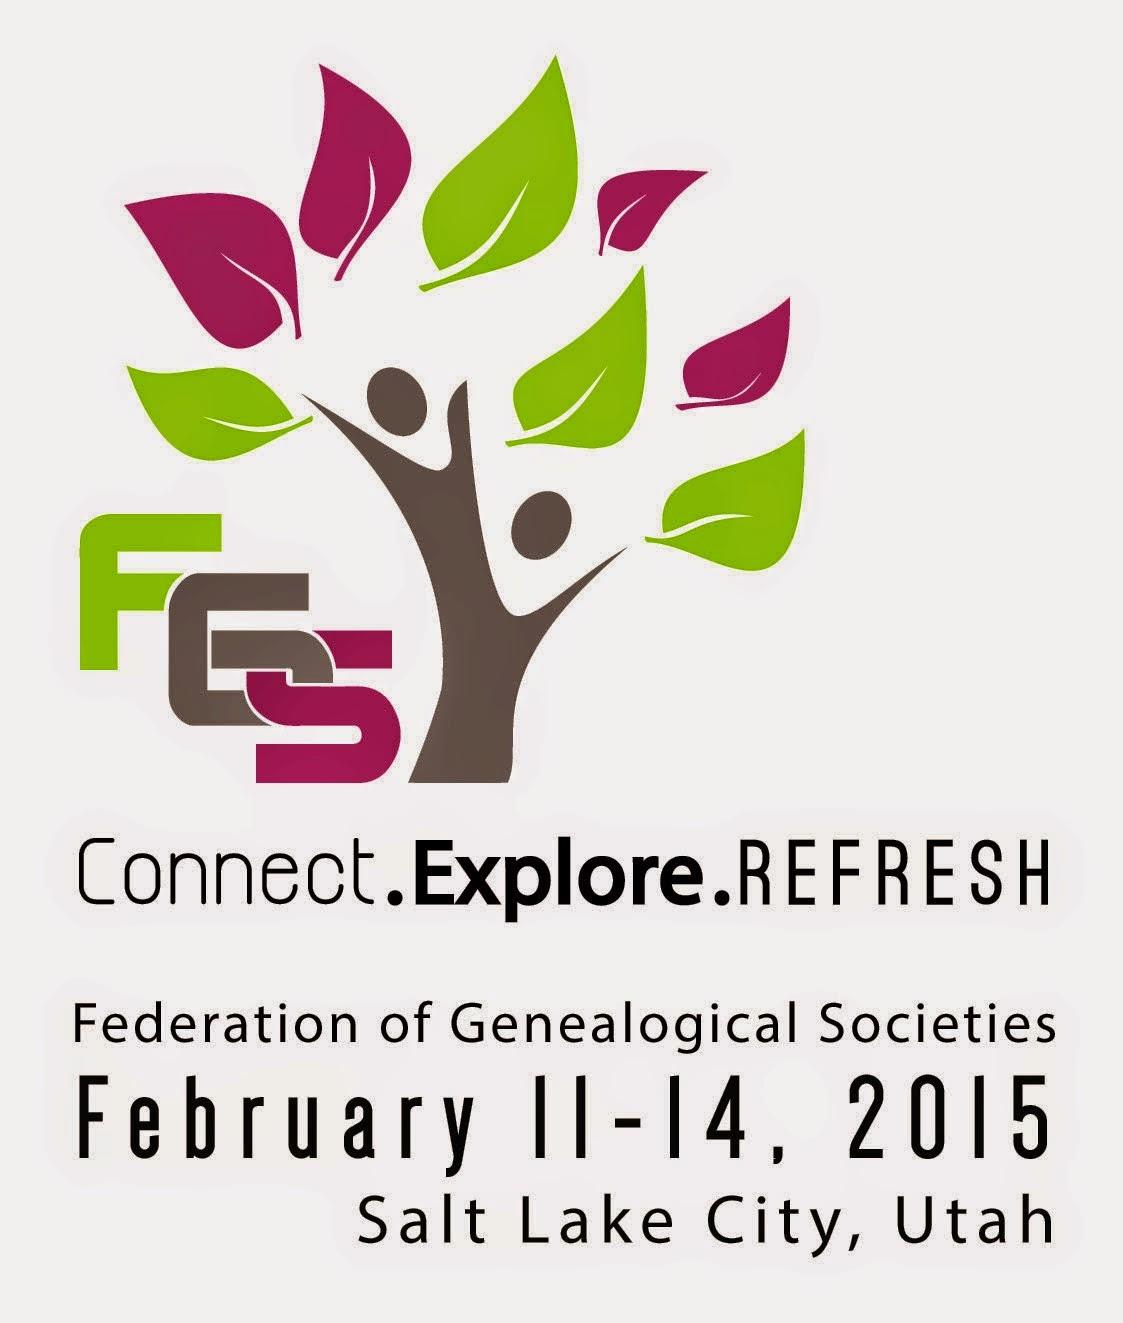 FGS 2015 Conference